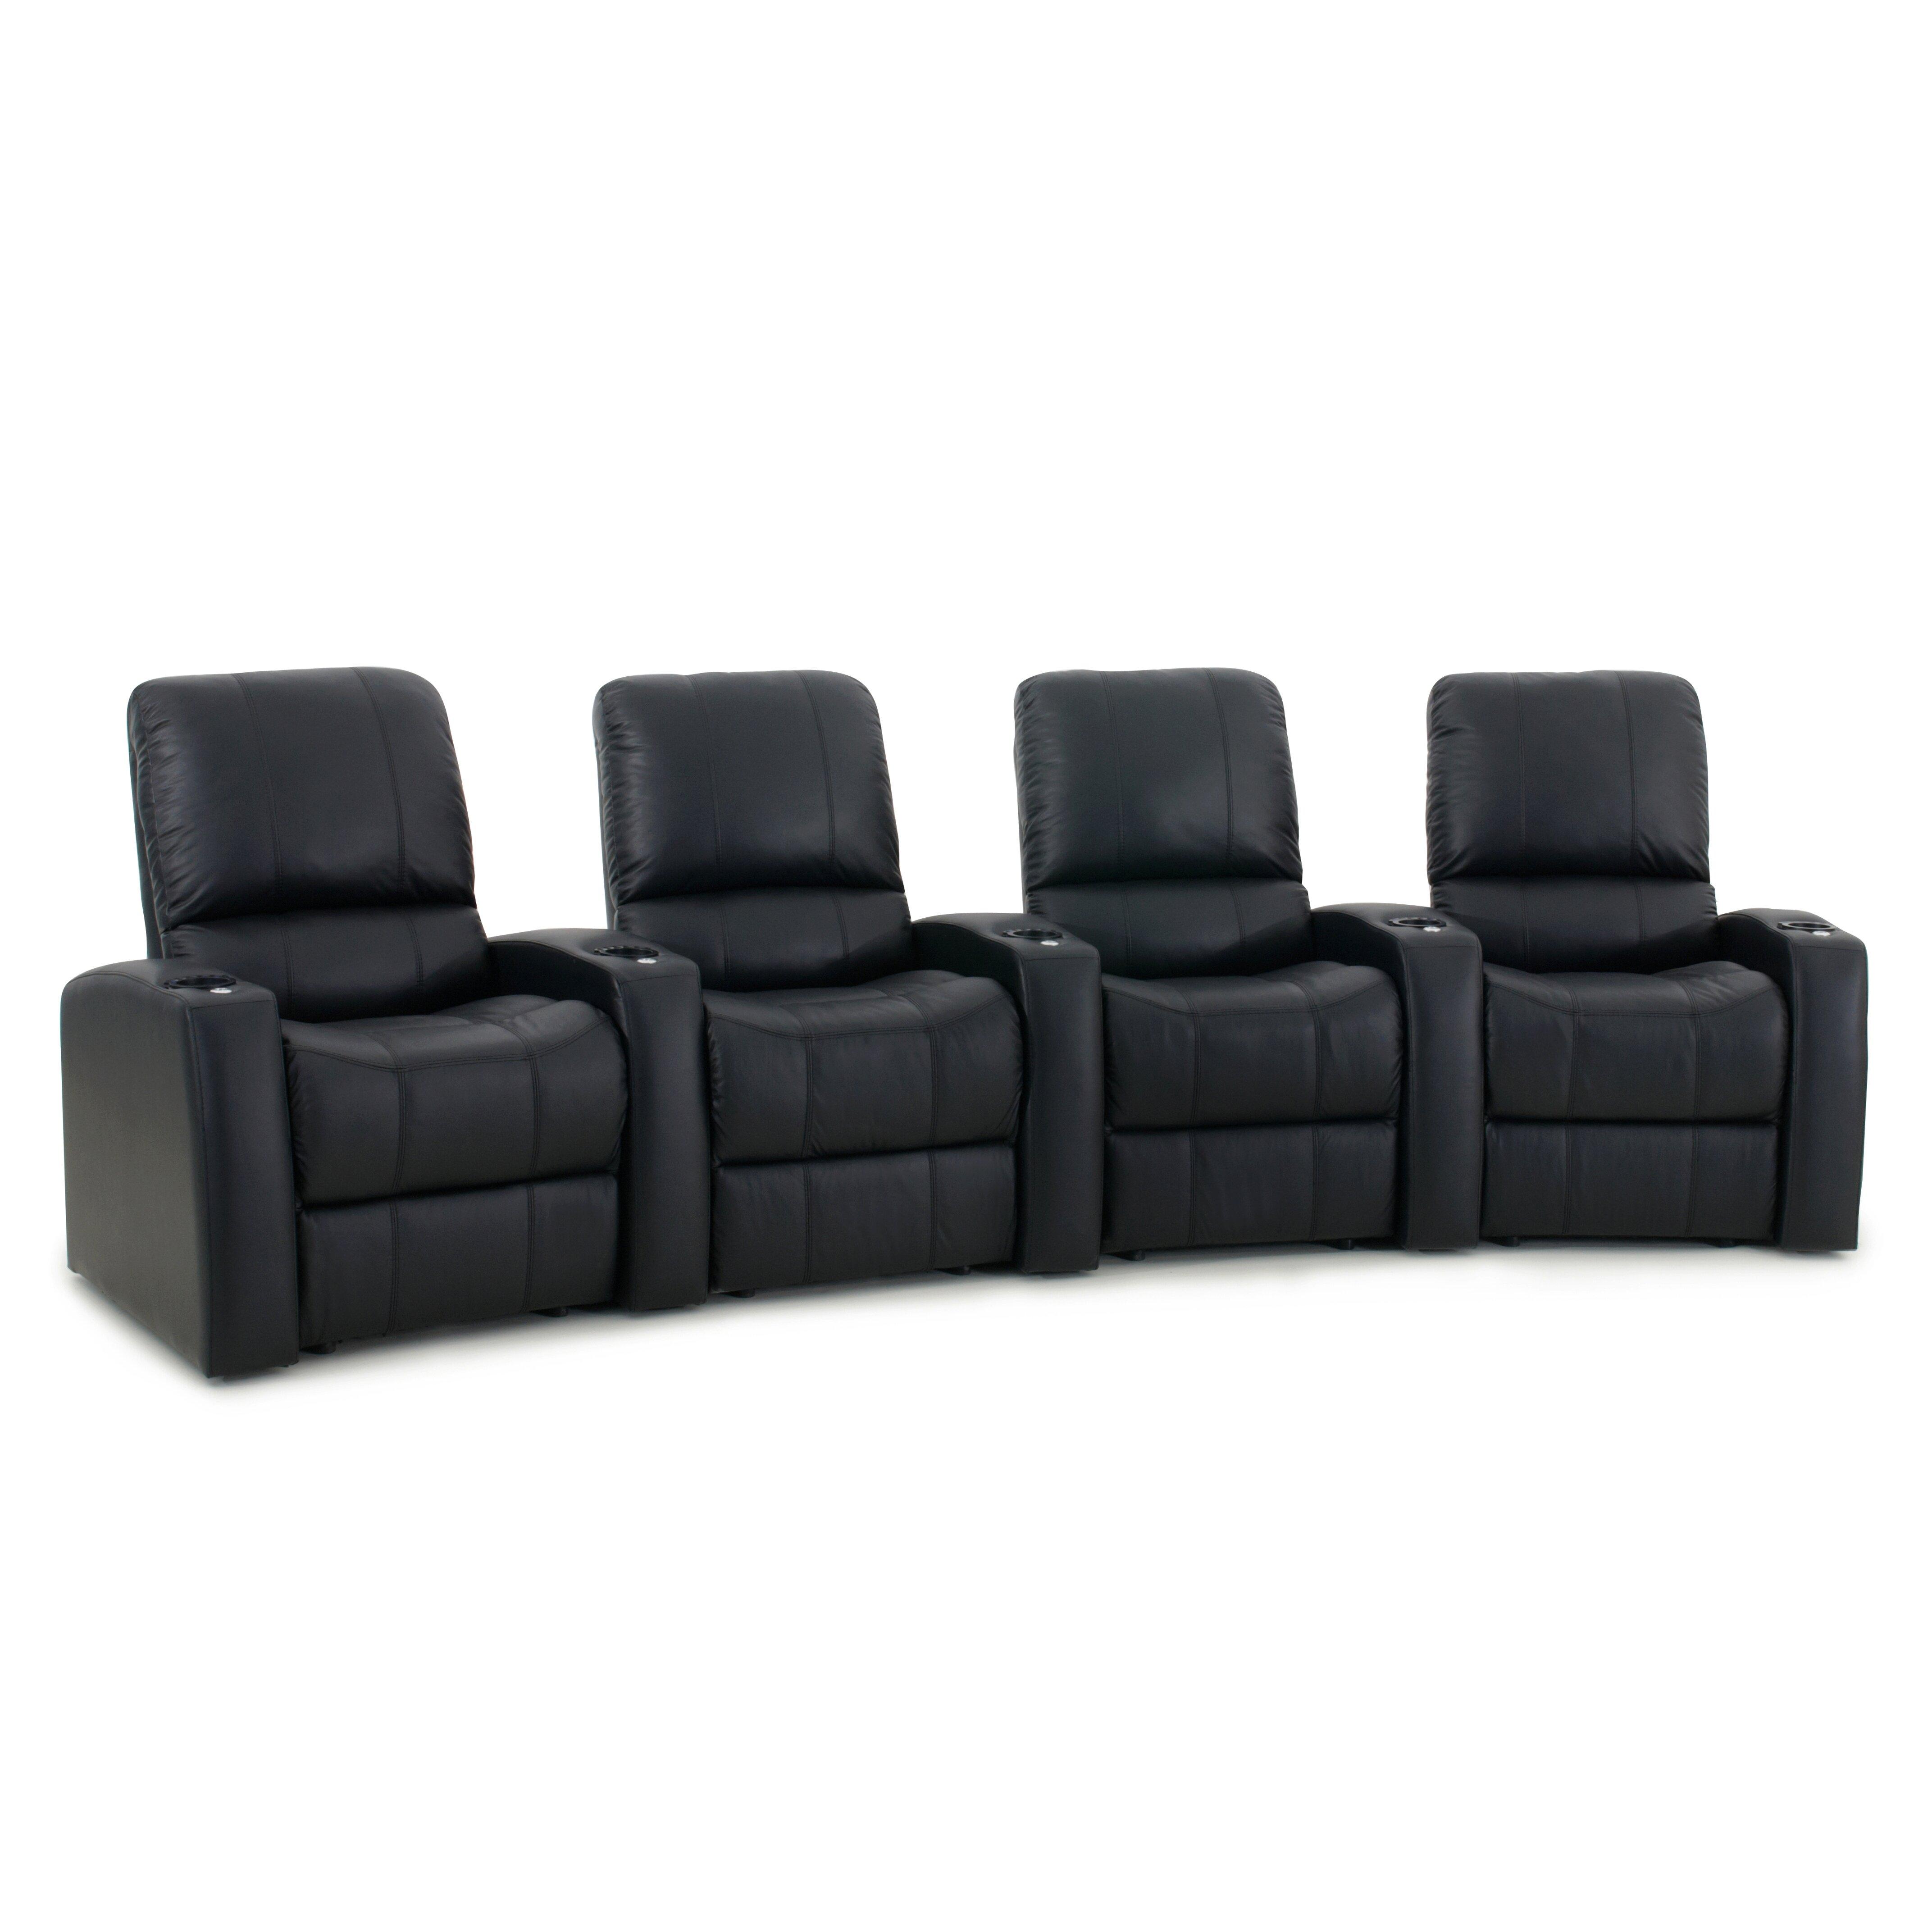 Berkline Recliner Sofa Images 15 Leather Sleeper